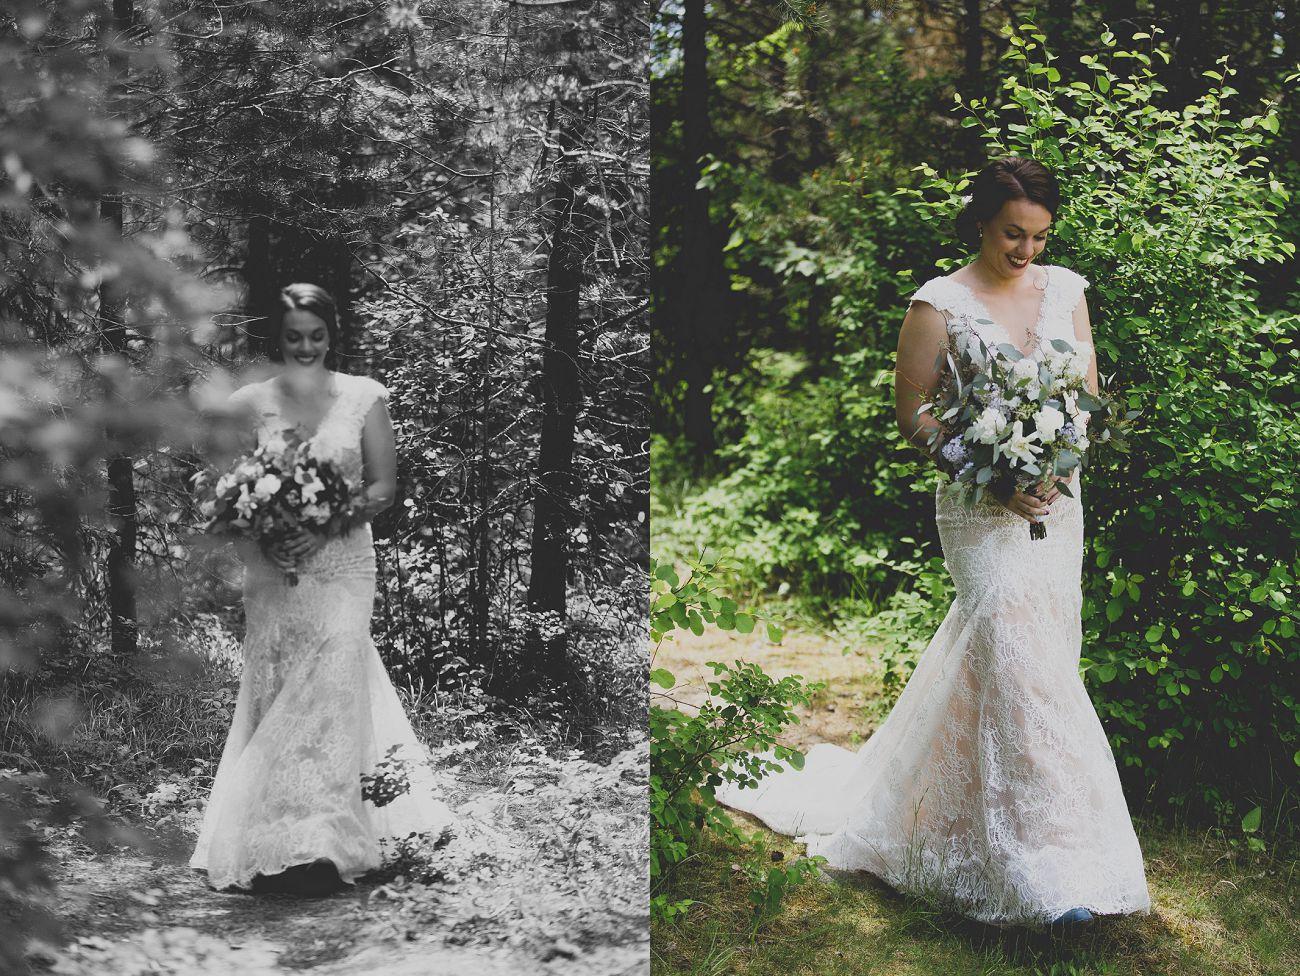 Jennifer_Mooney_Photo_Glacier_Park_Weddings_Elopement_00016.jpg